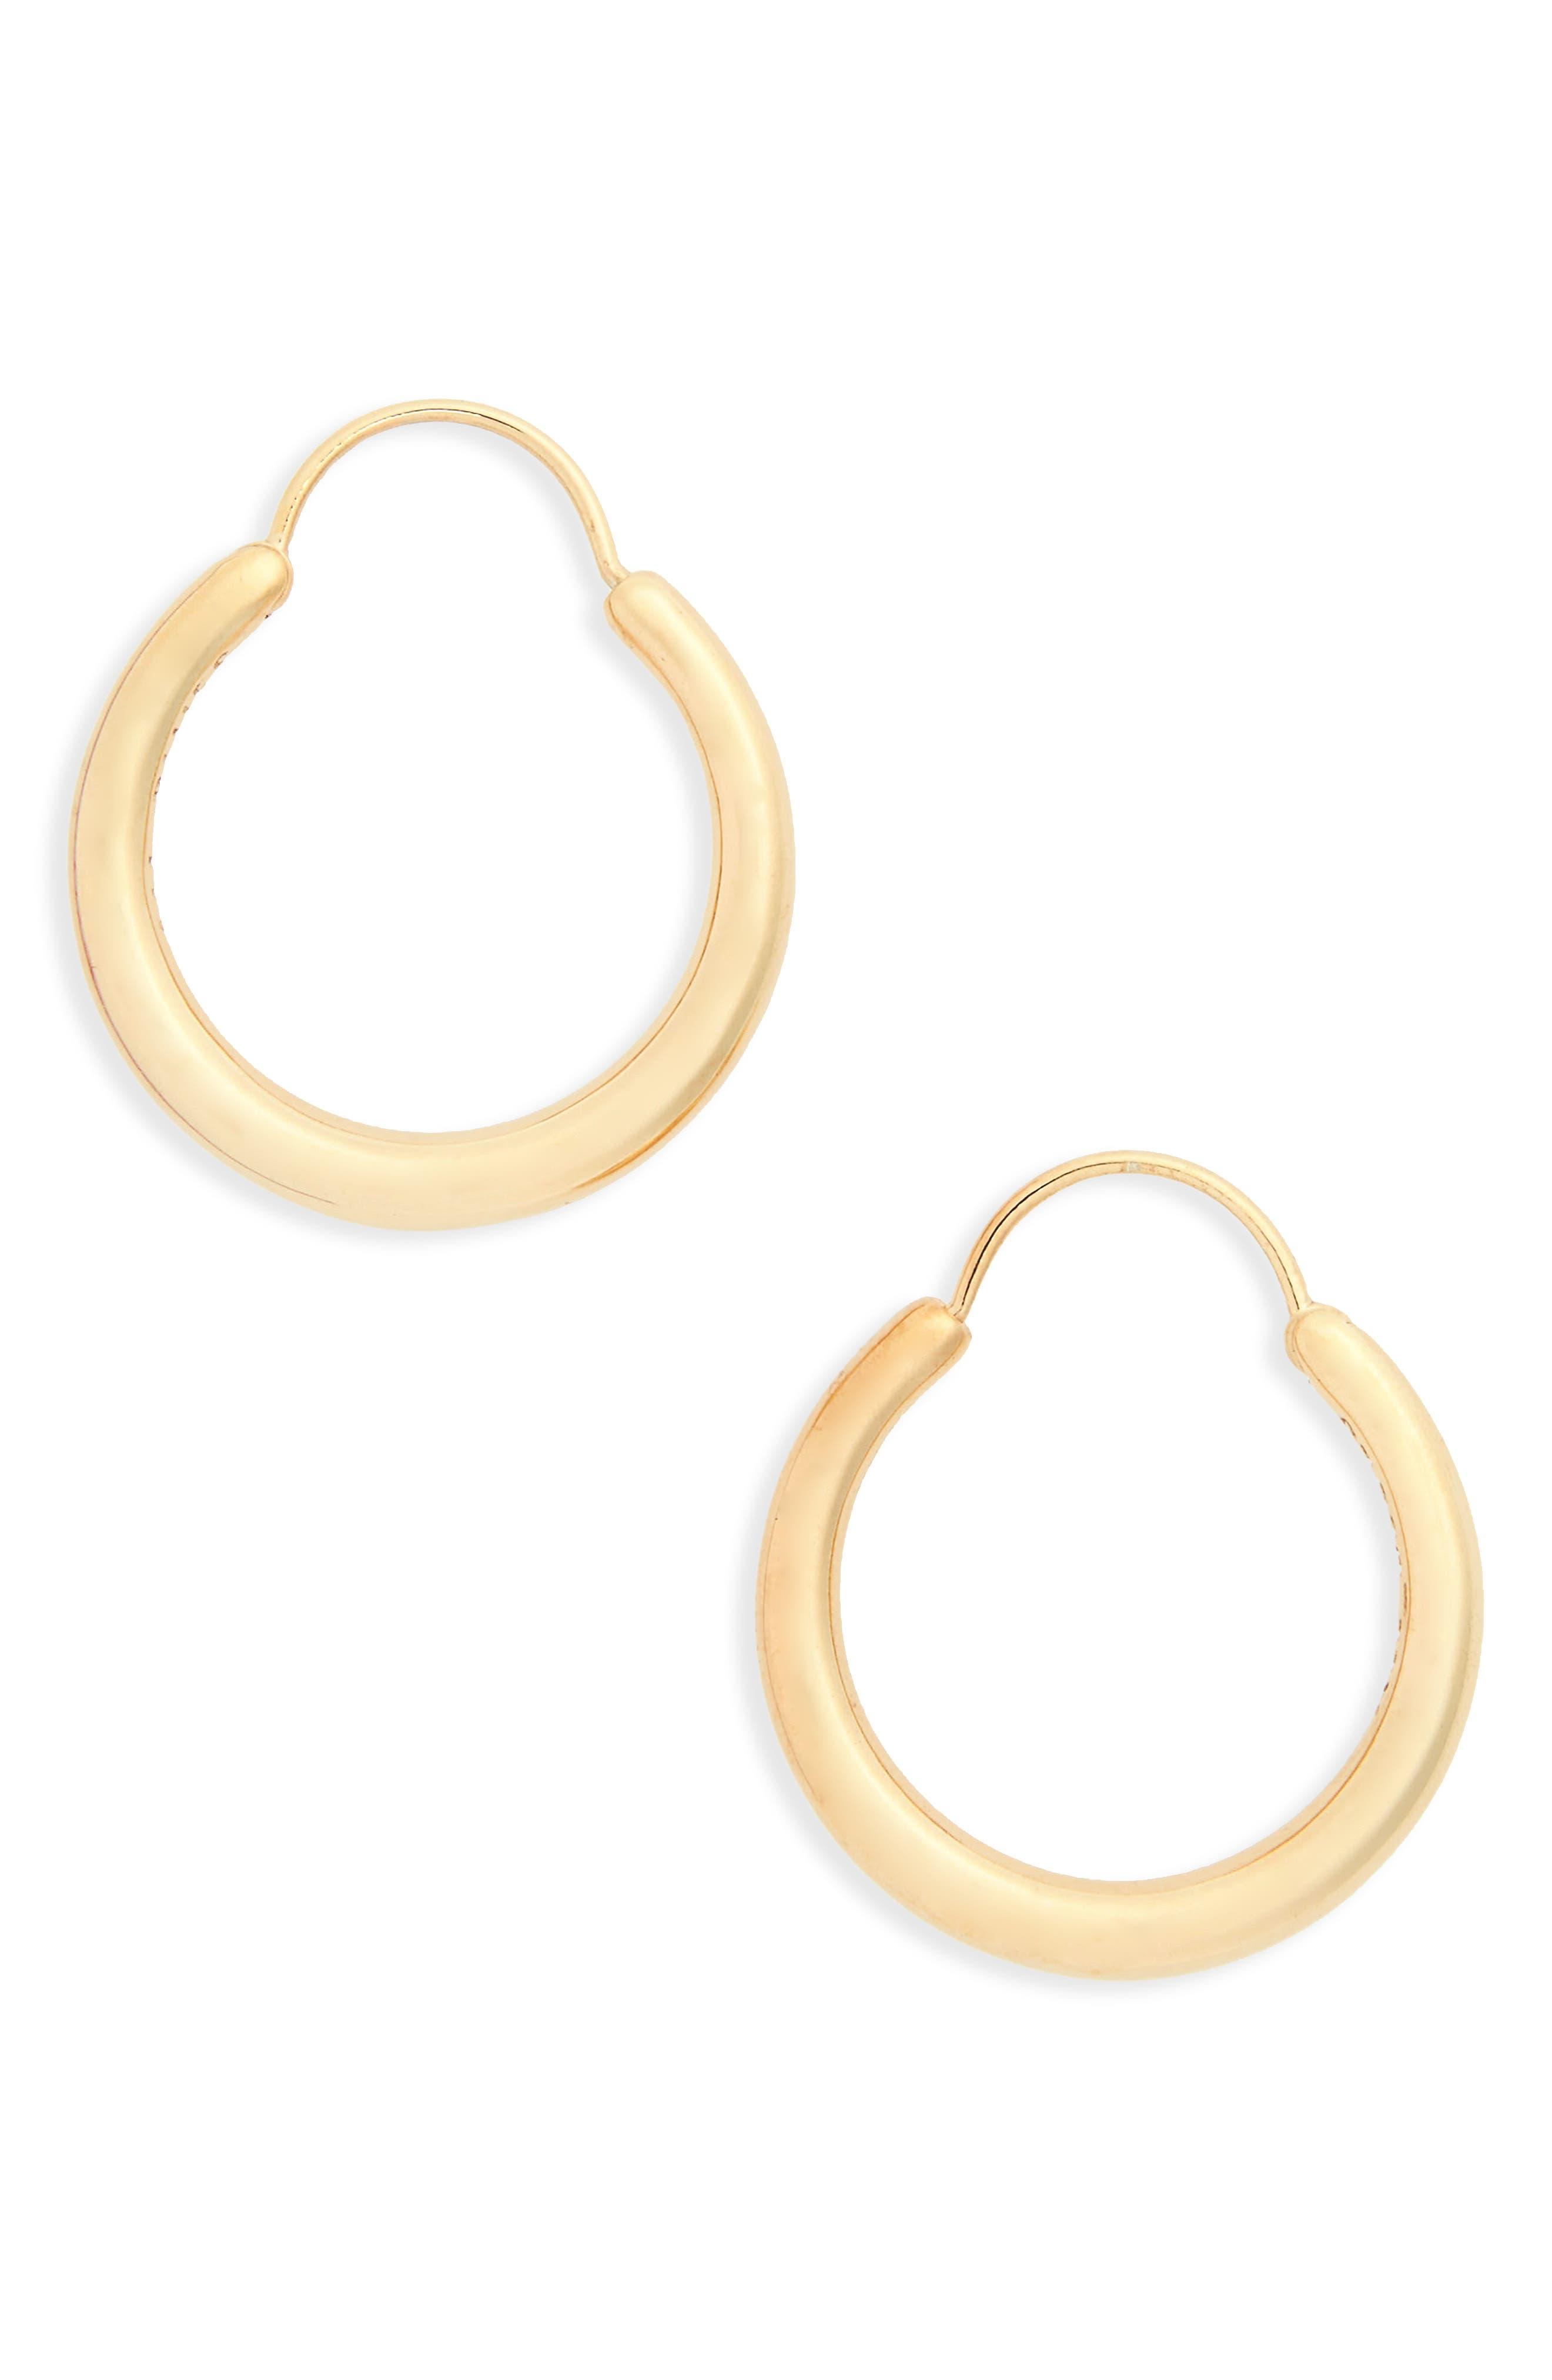 Small Snake Polished Vermeil Earrings,                             Main thumbnail 1, color,